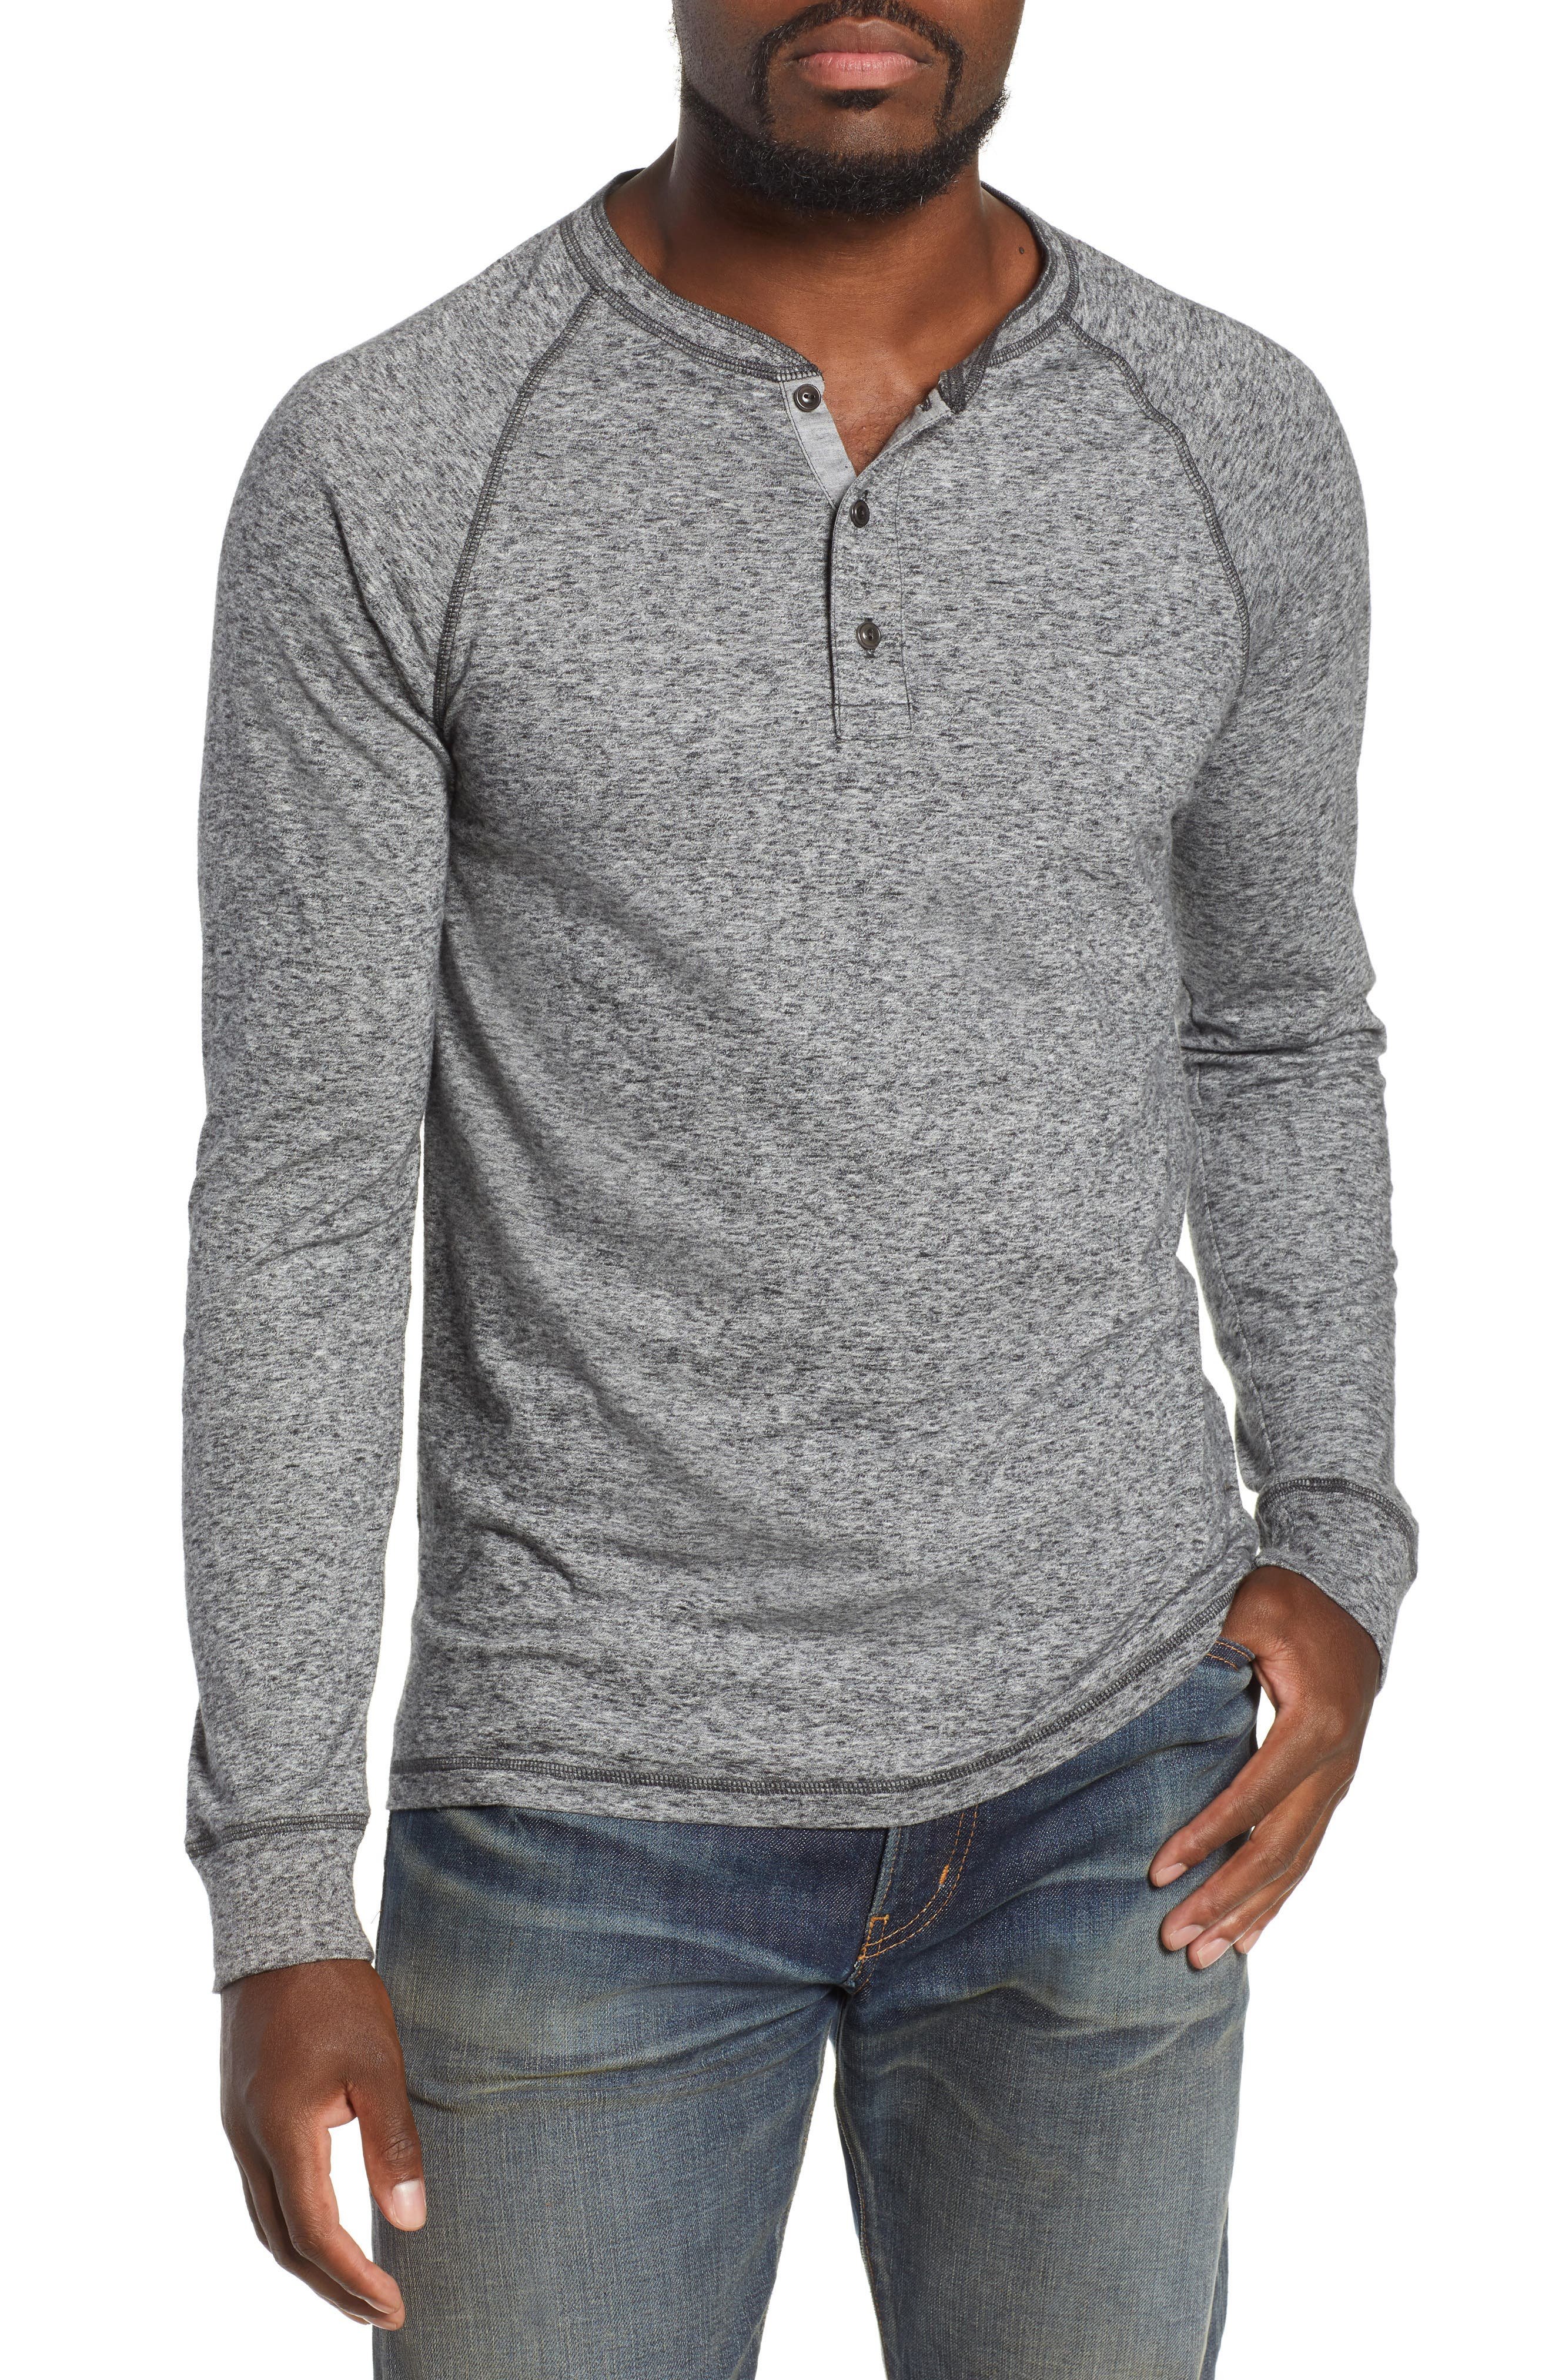 FAHERTY Men'S Luxe Heather Organic Slub Henley Shirt in Charcoal